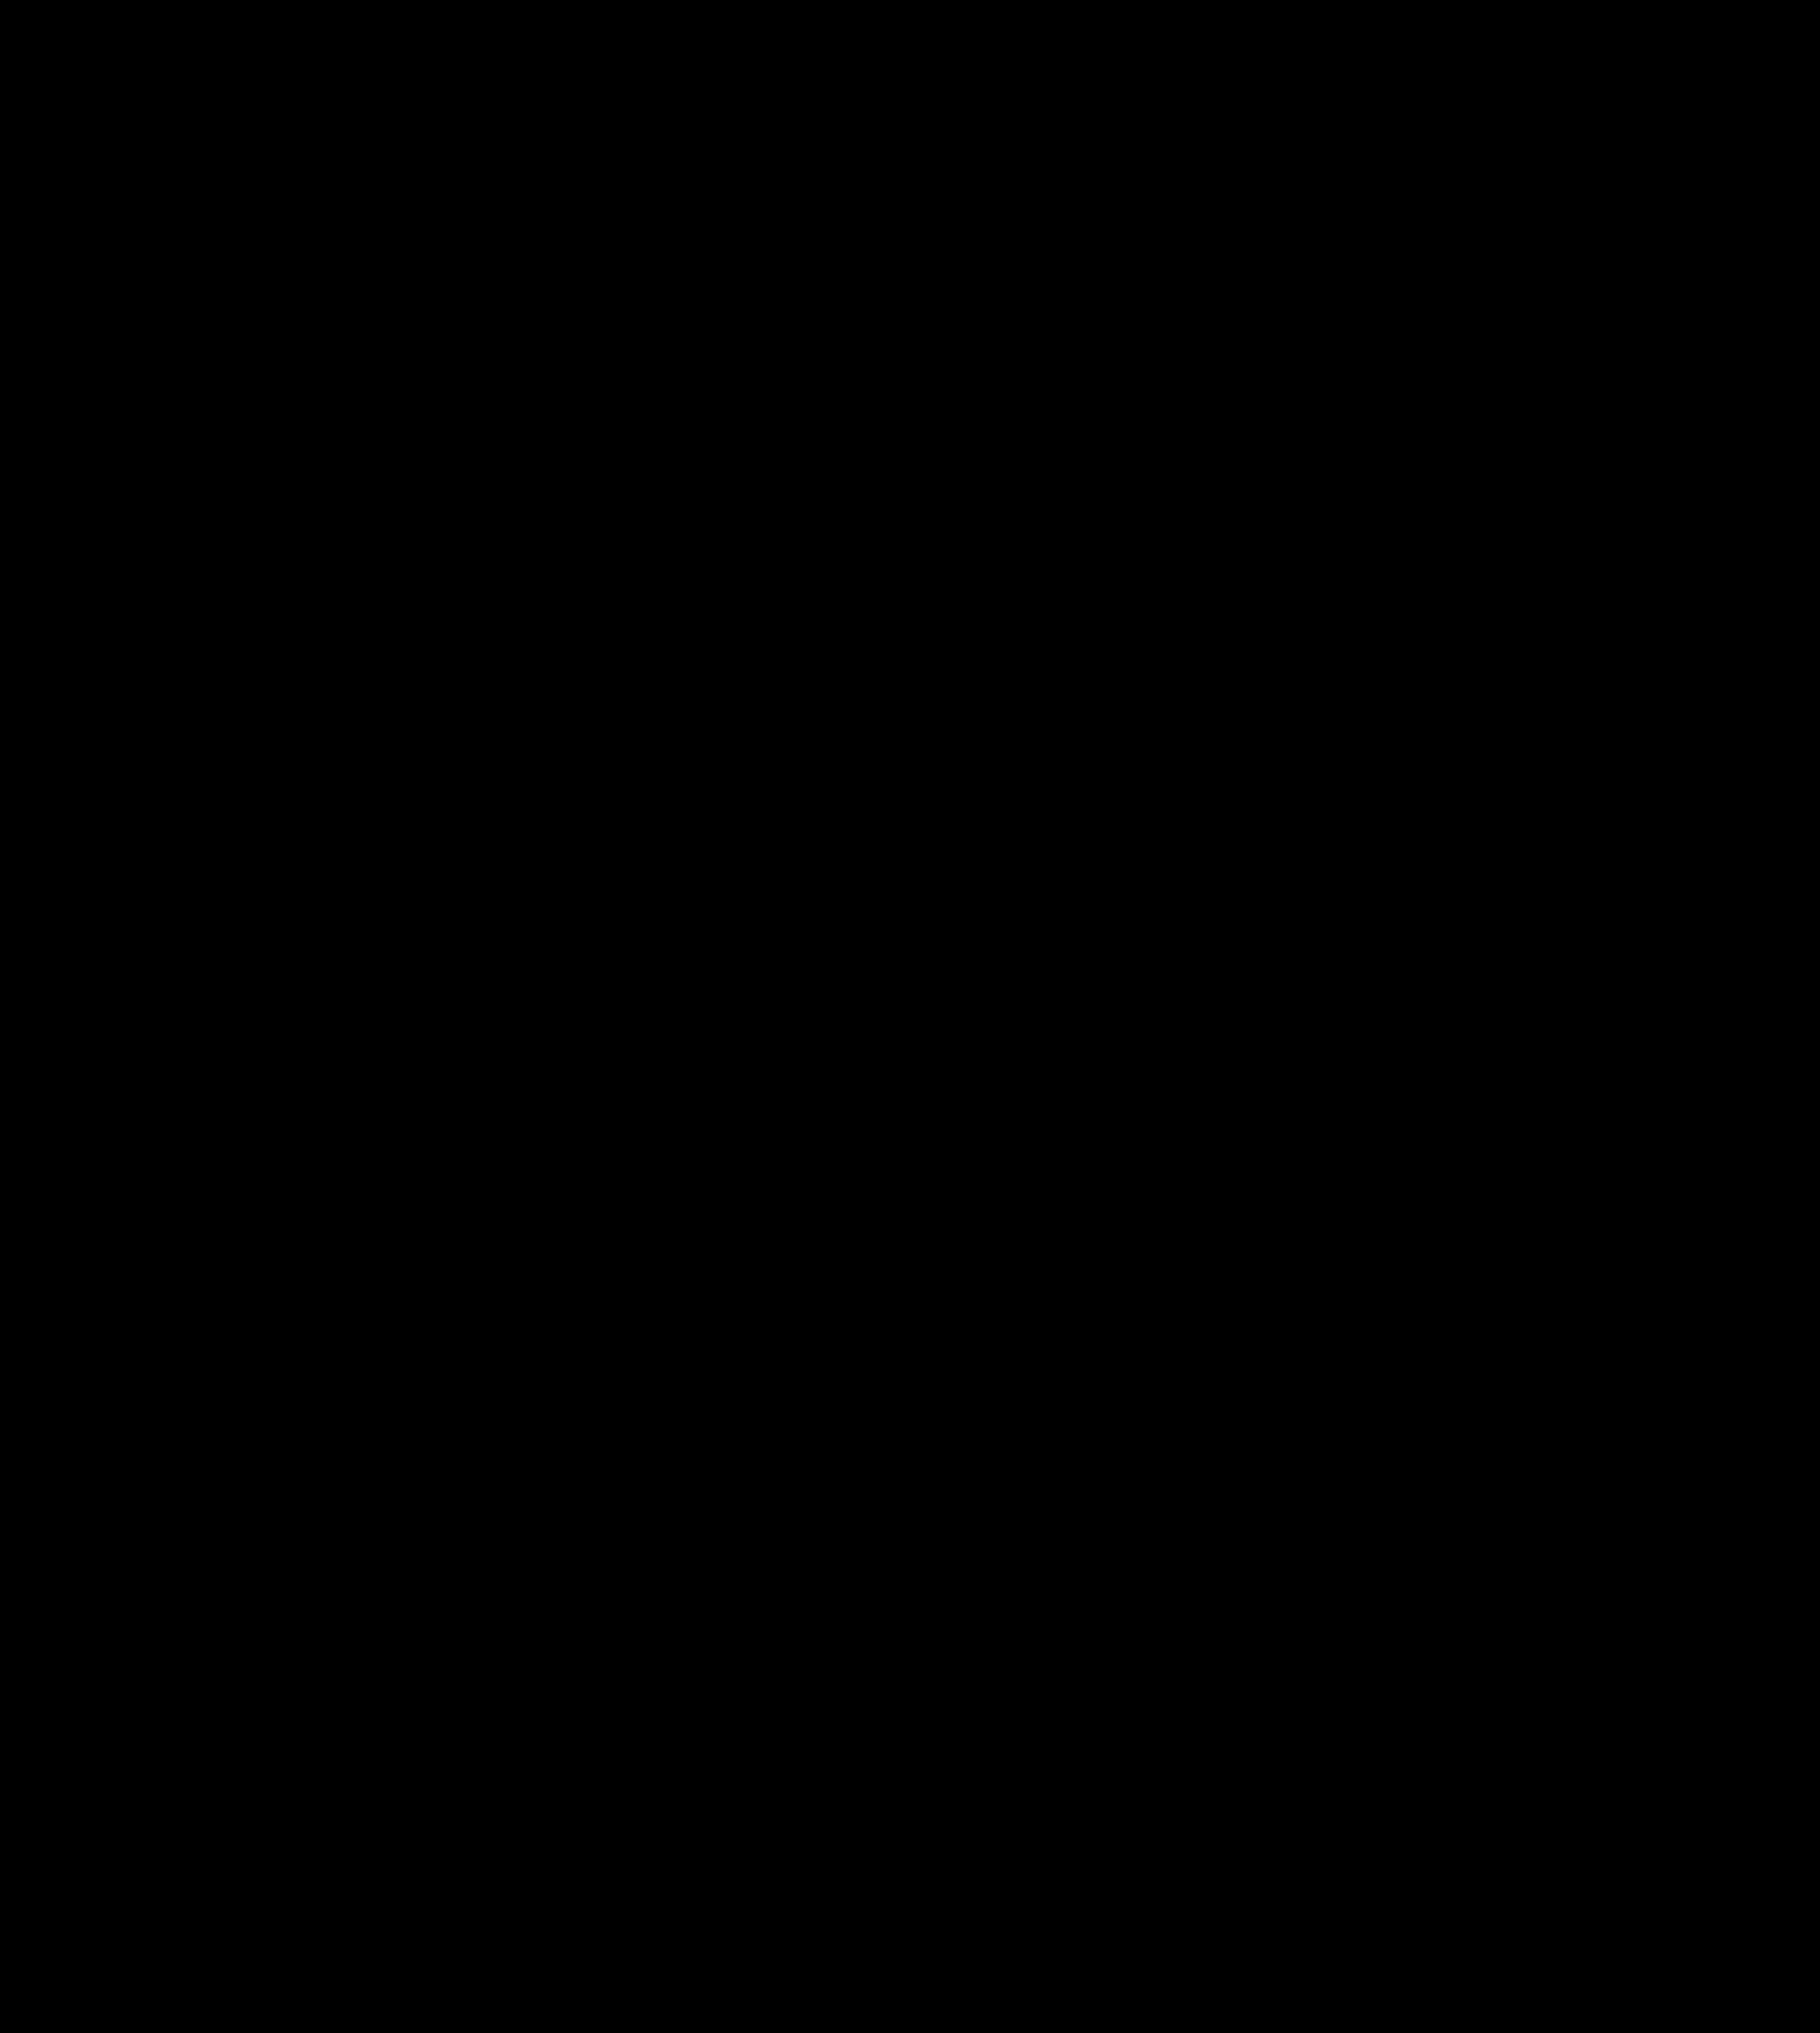 Hydrangea clipart Free Art Clip Hydrangea Hydrangea